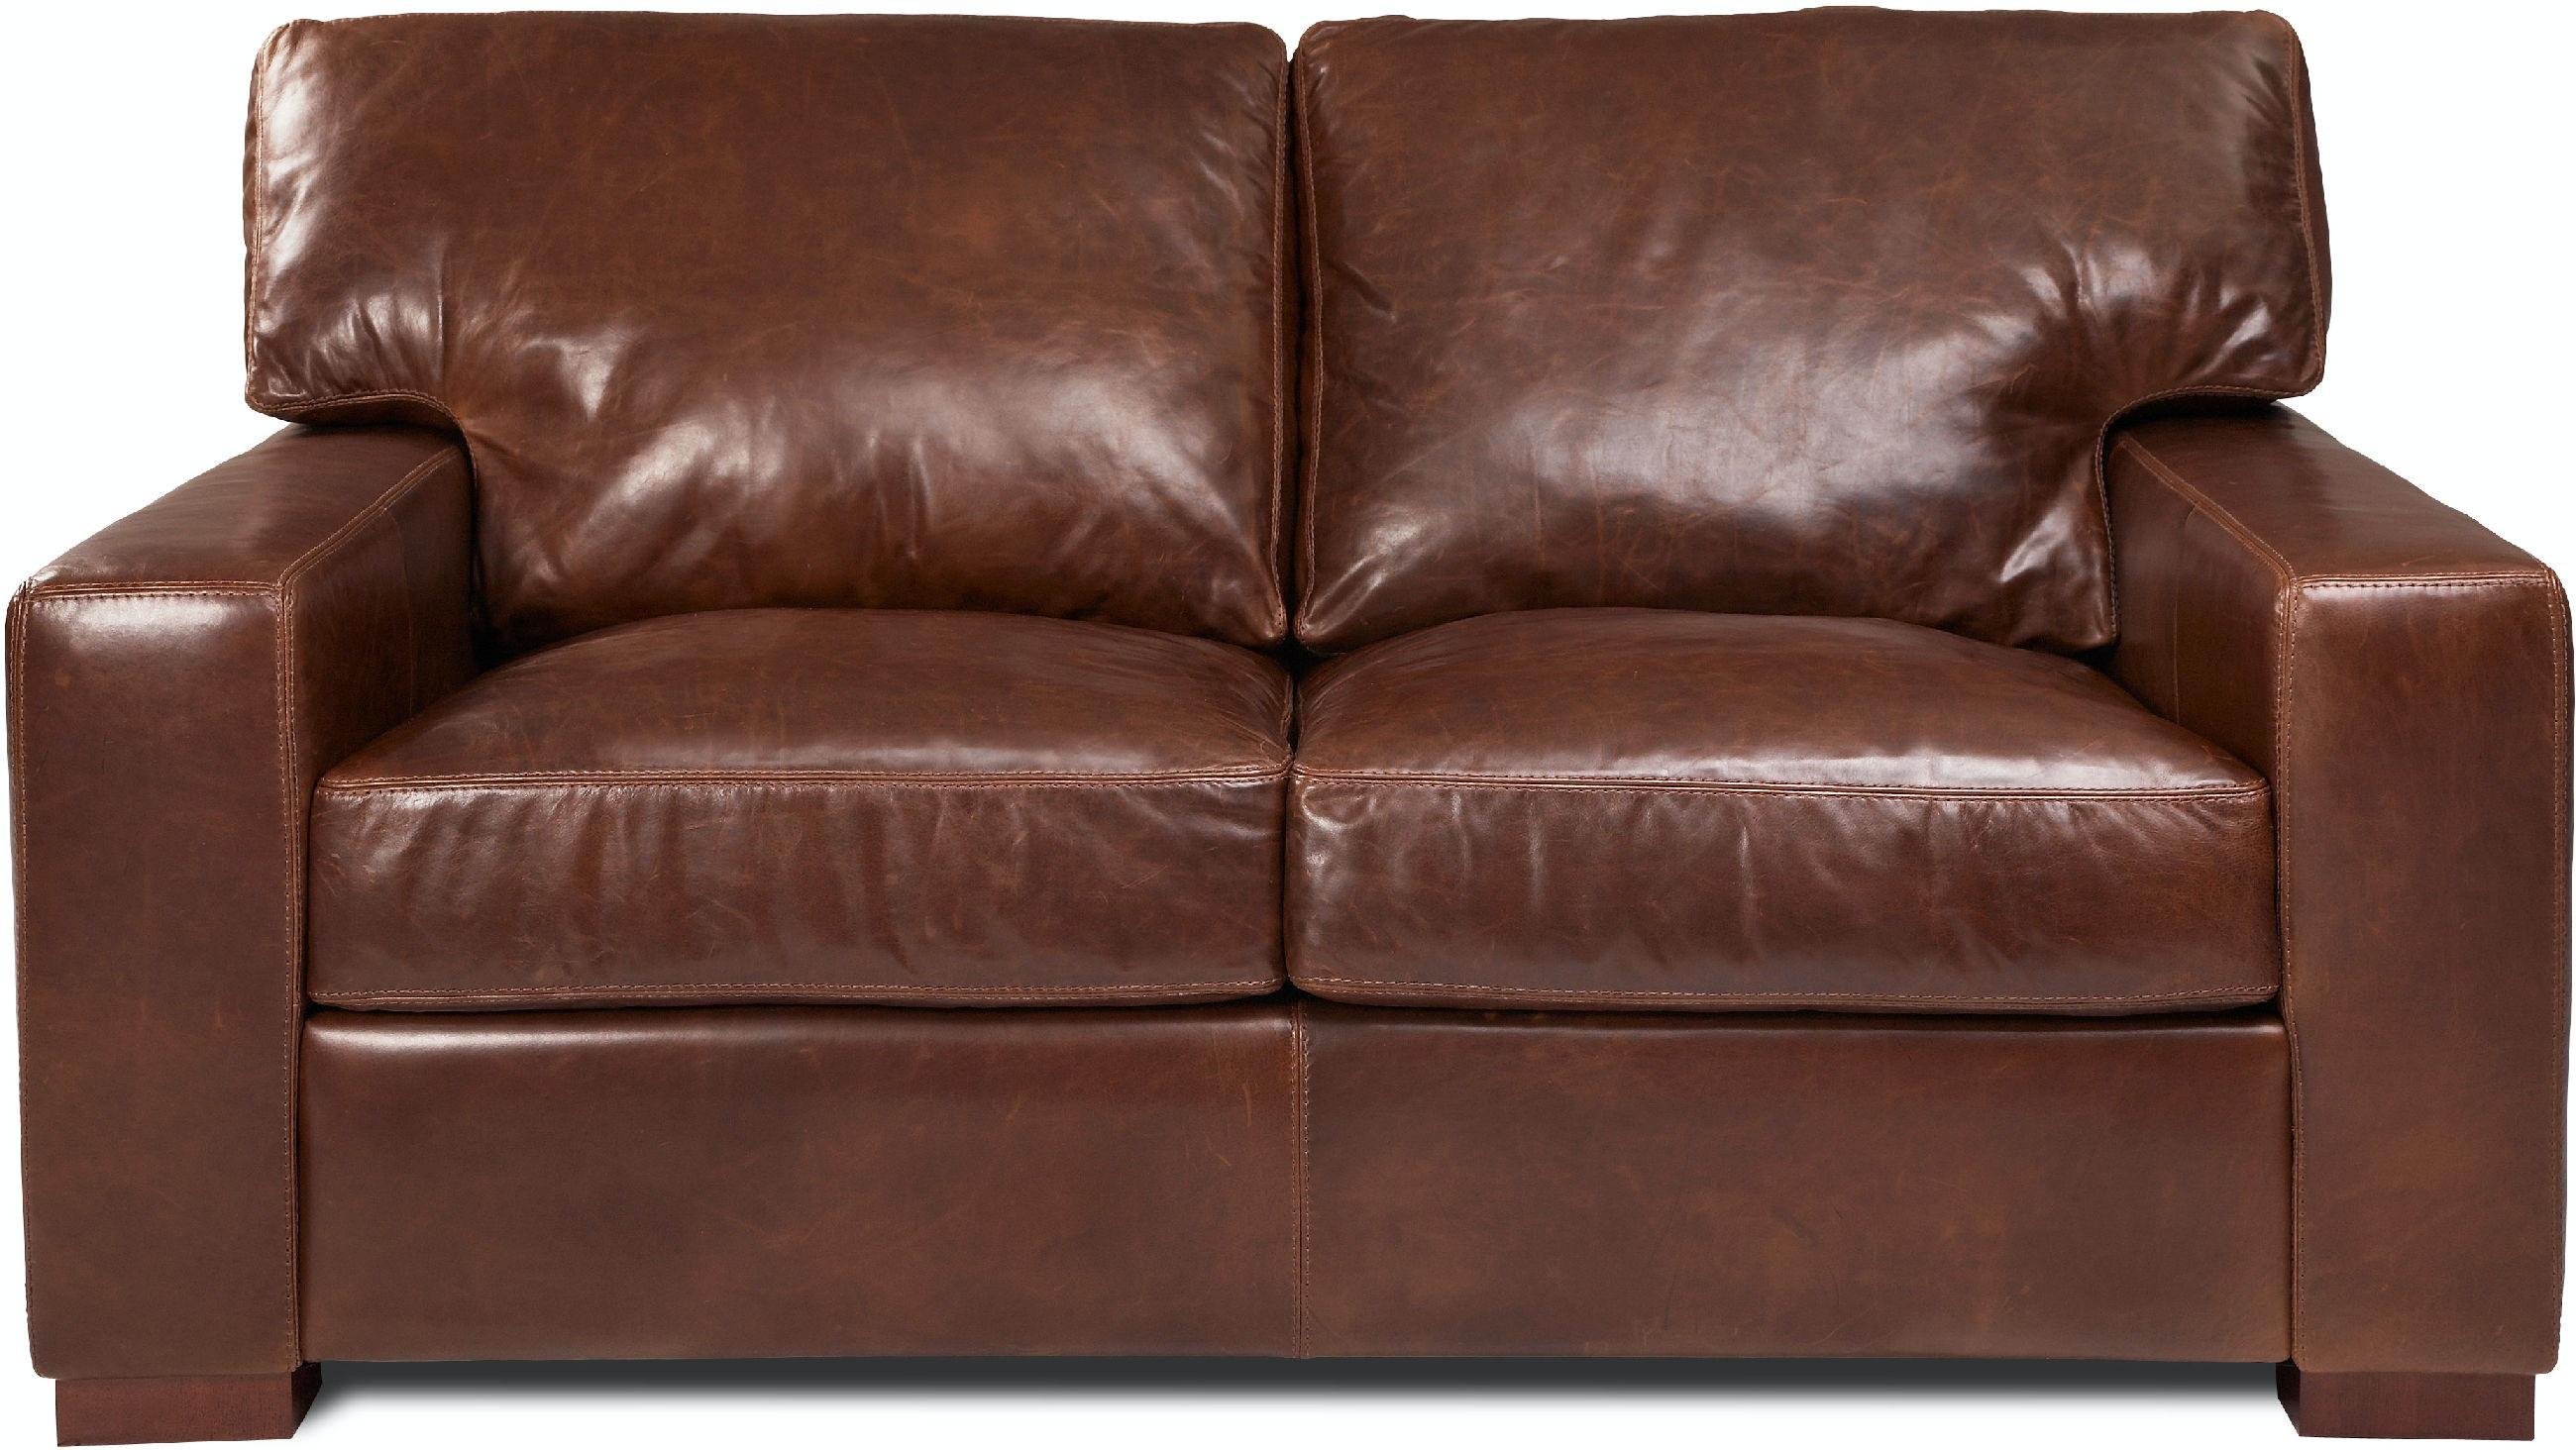 American Leather Living Room Loveseat Dan Lvs St Von